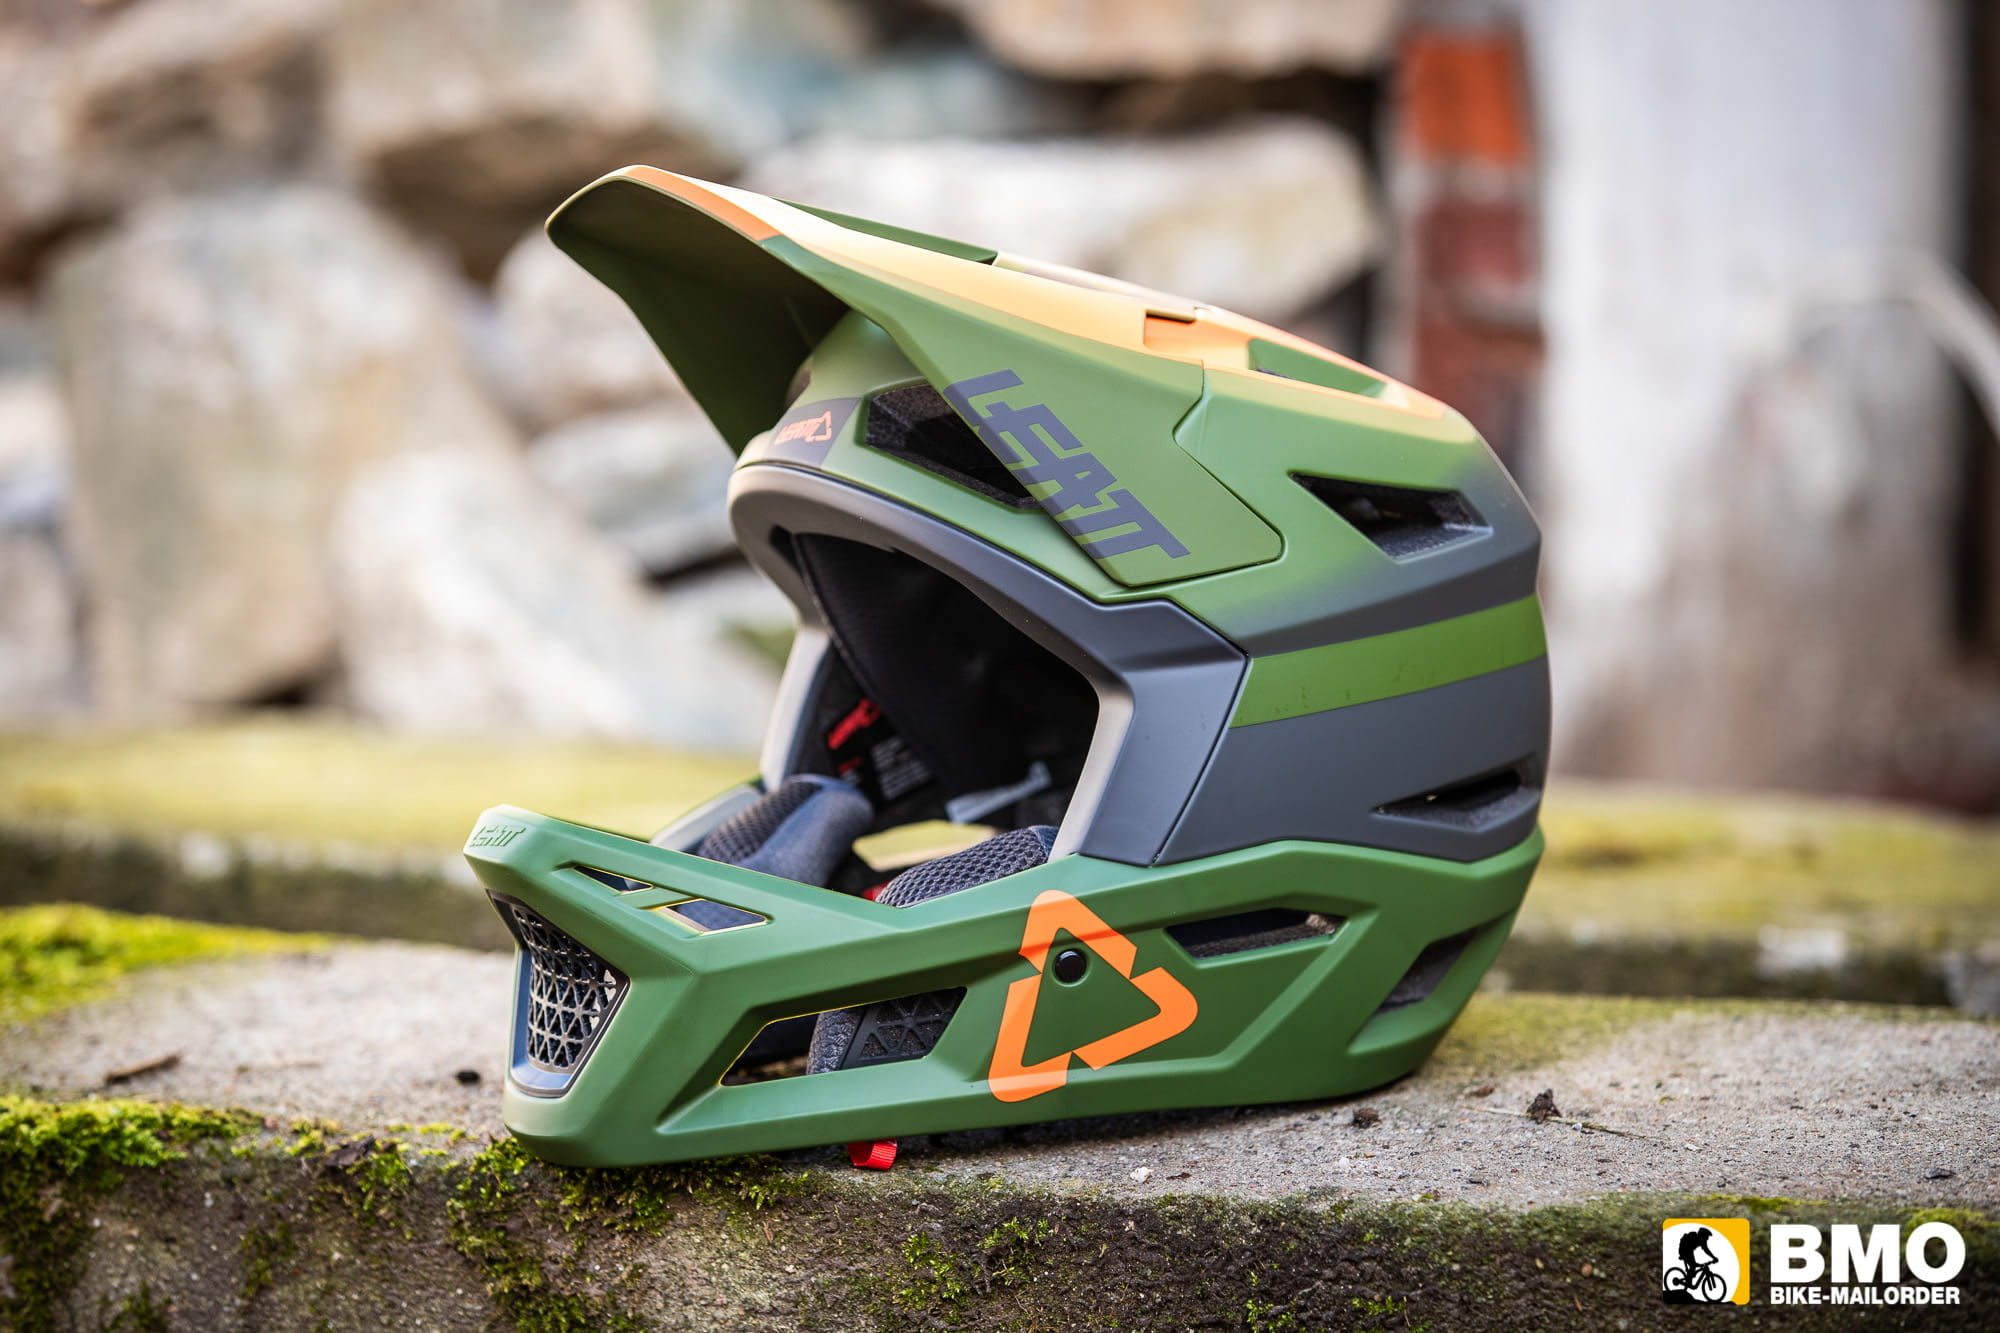 Leatt-DBX-4-0-Super-Ventilated-Fullface-Helm-Bike-Mailorder-2